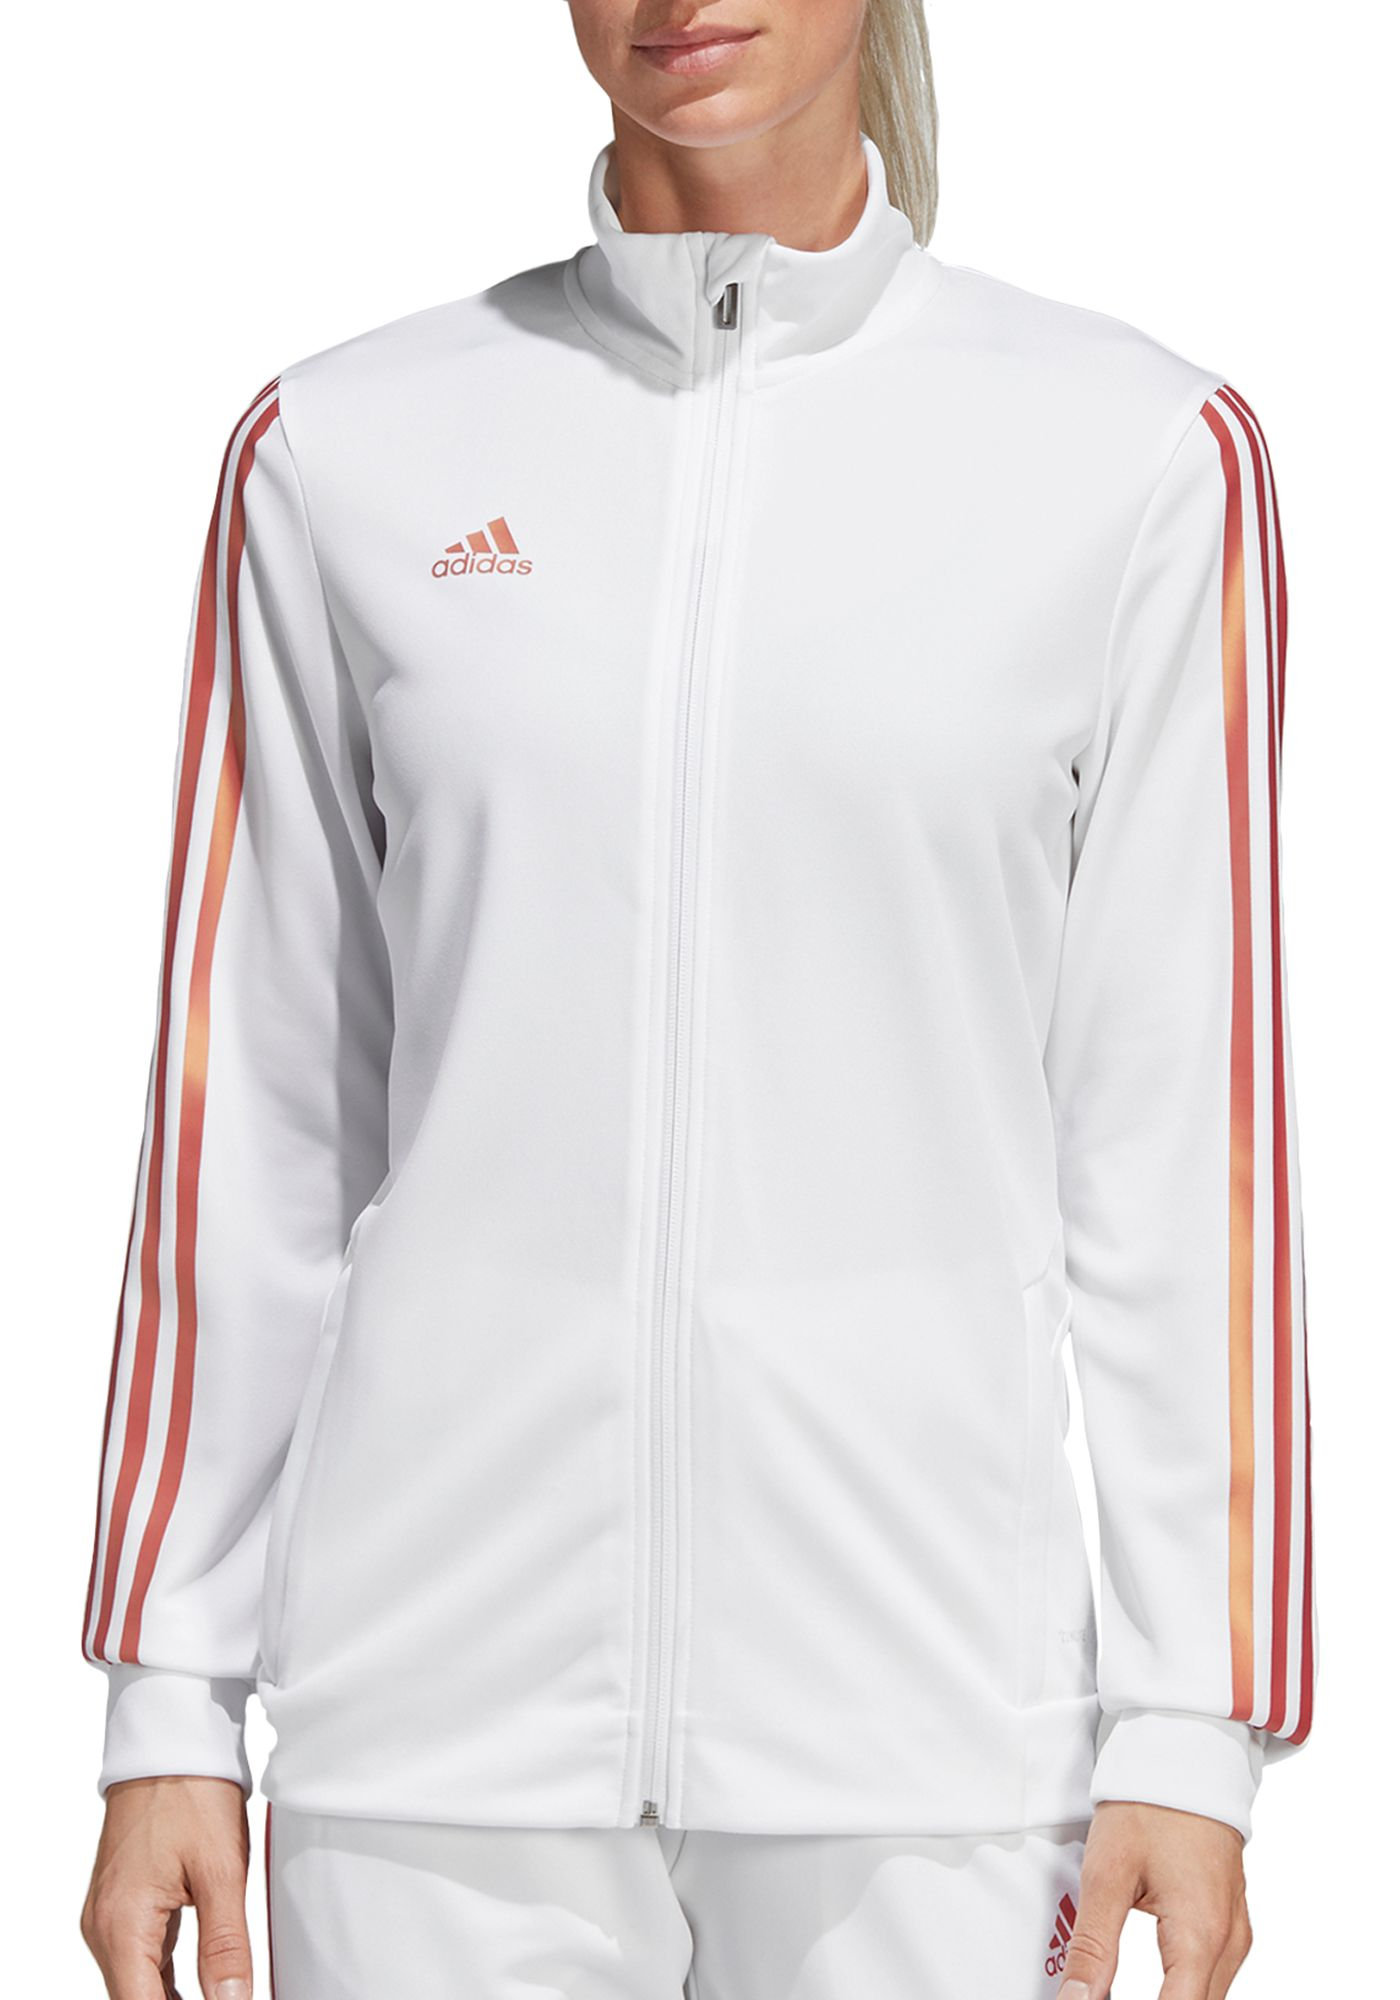 adidas Women's Tiro Windbreaker Jacket